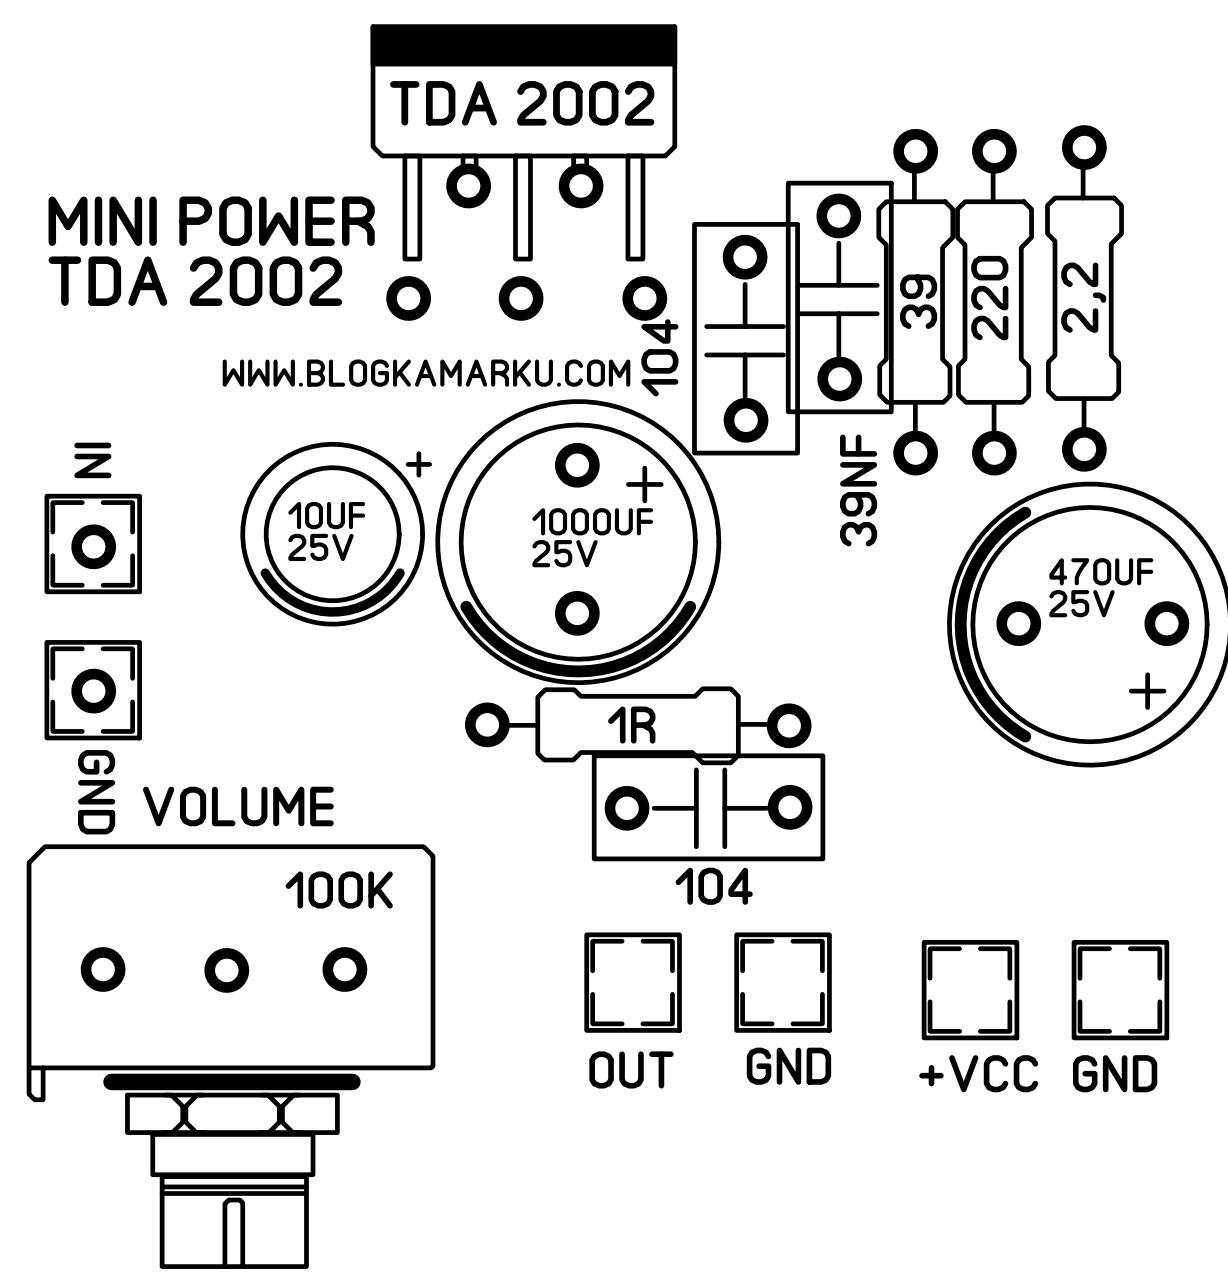 Power mini lifier tda 2002